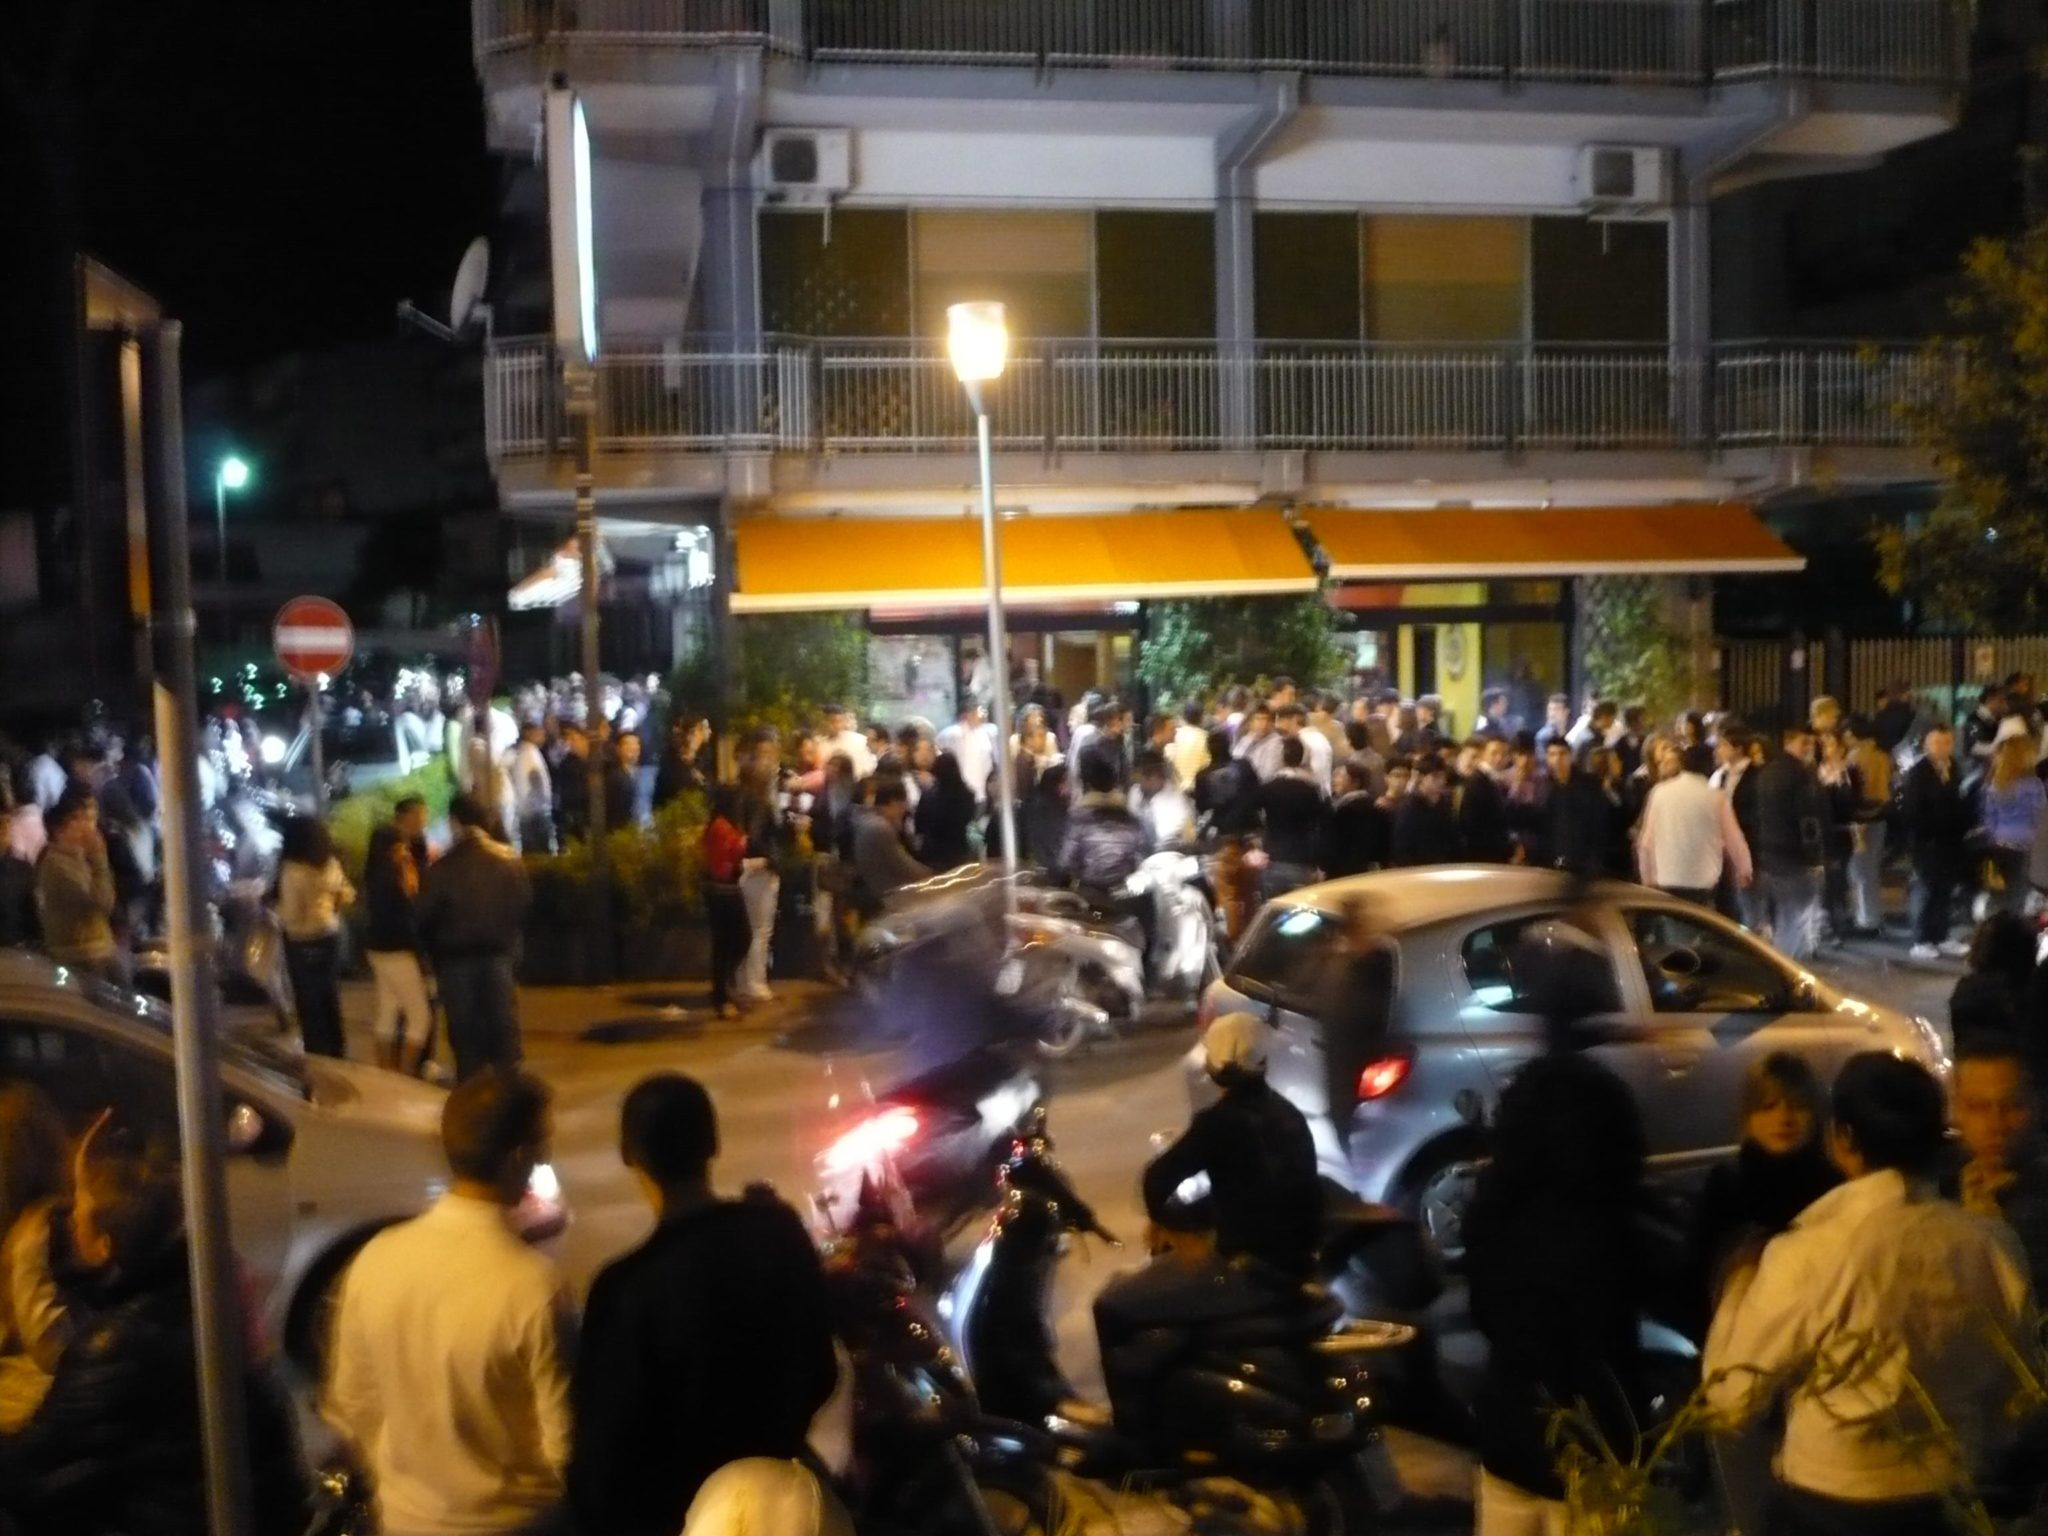 Movida violenta ad Aversa: migrante esplode colpi in aria a salve